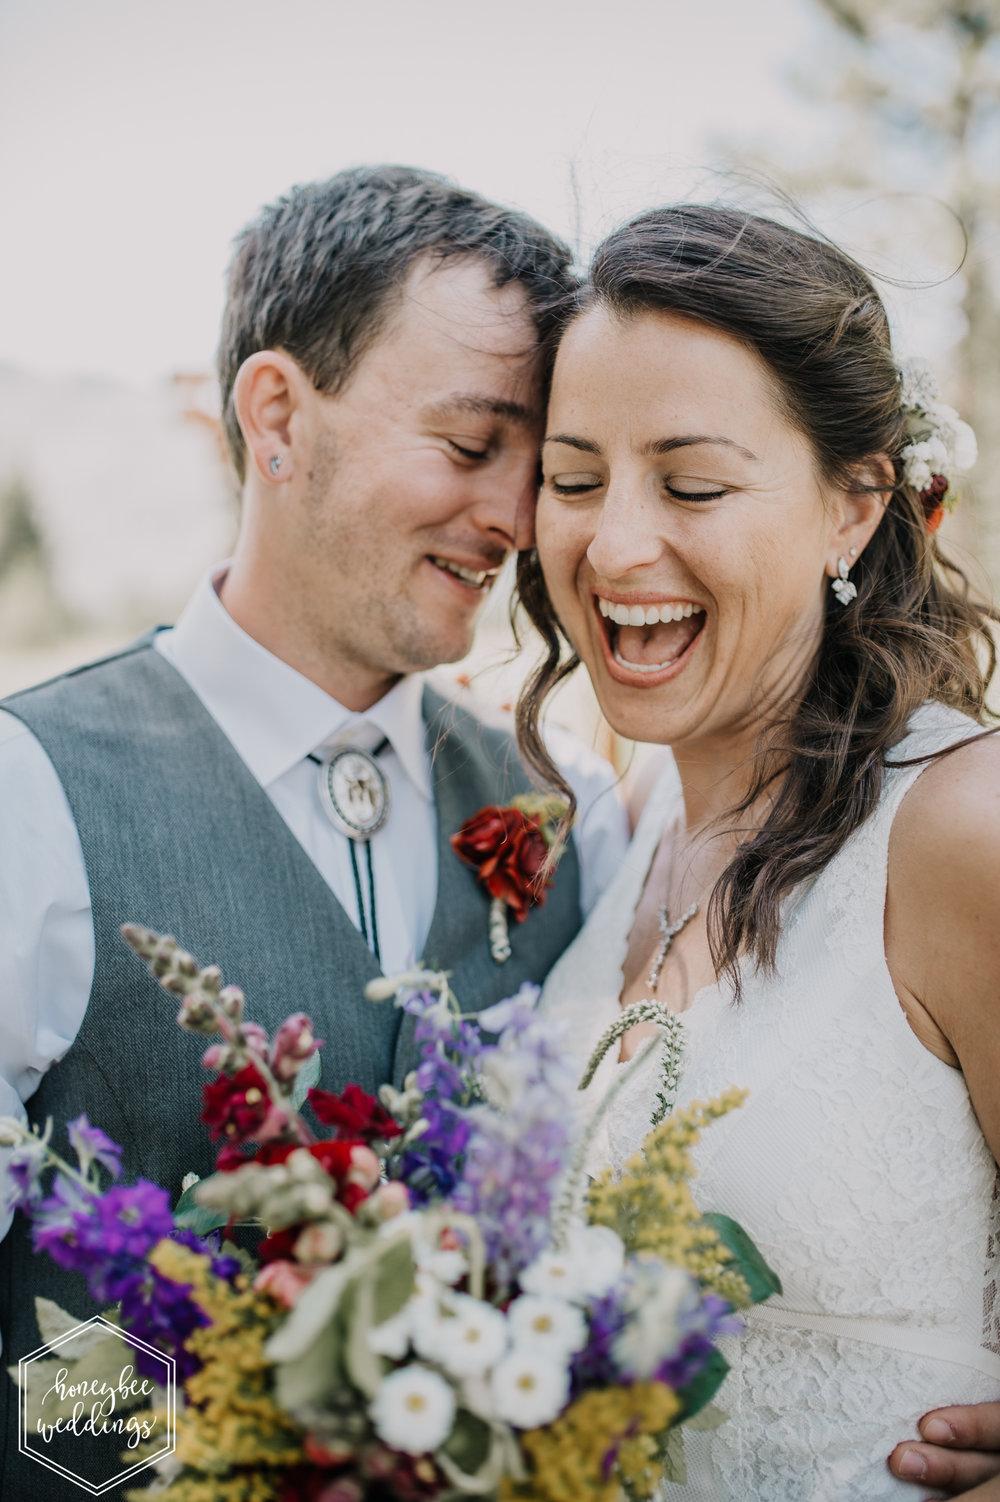 146 White Raven Wedding_Montana Wedding Photographer_Honeybee Weddings_ Meghan Maloney + Arza Hammond 2018-0080-2.jpg